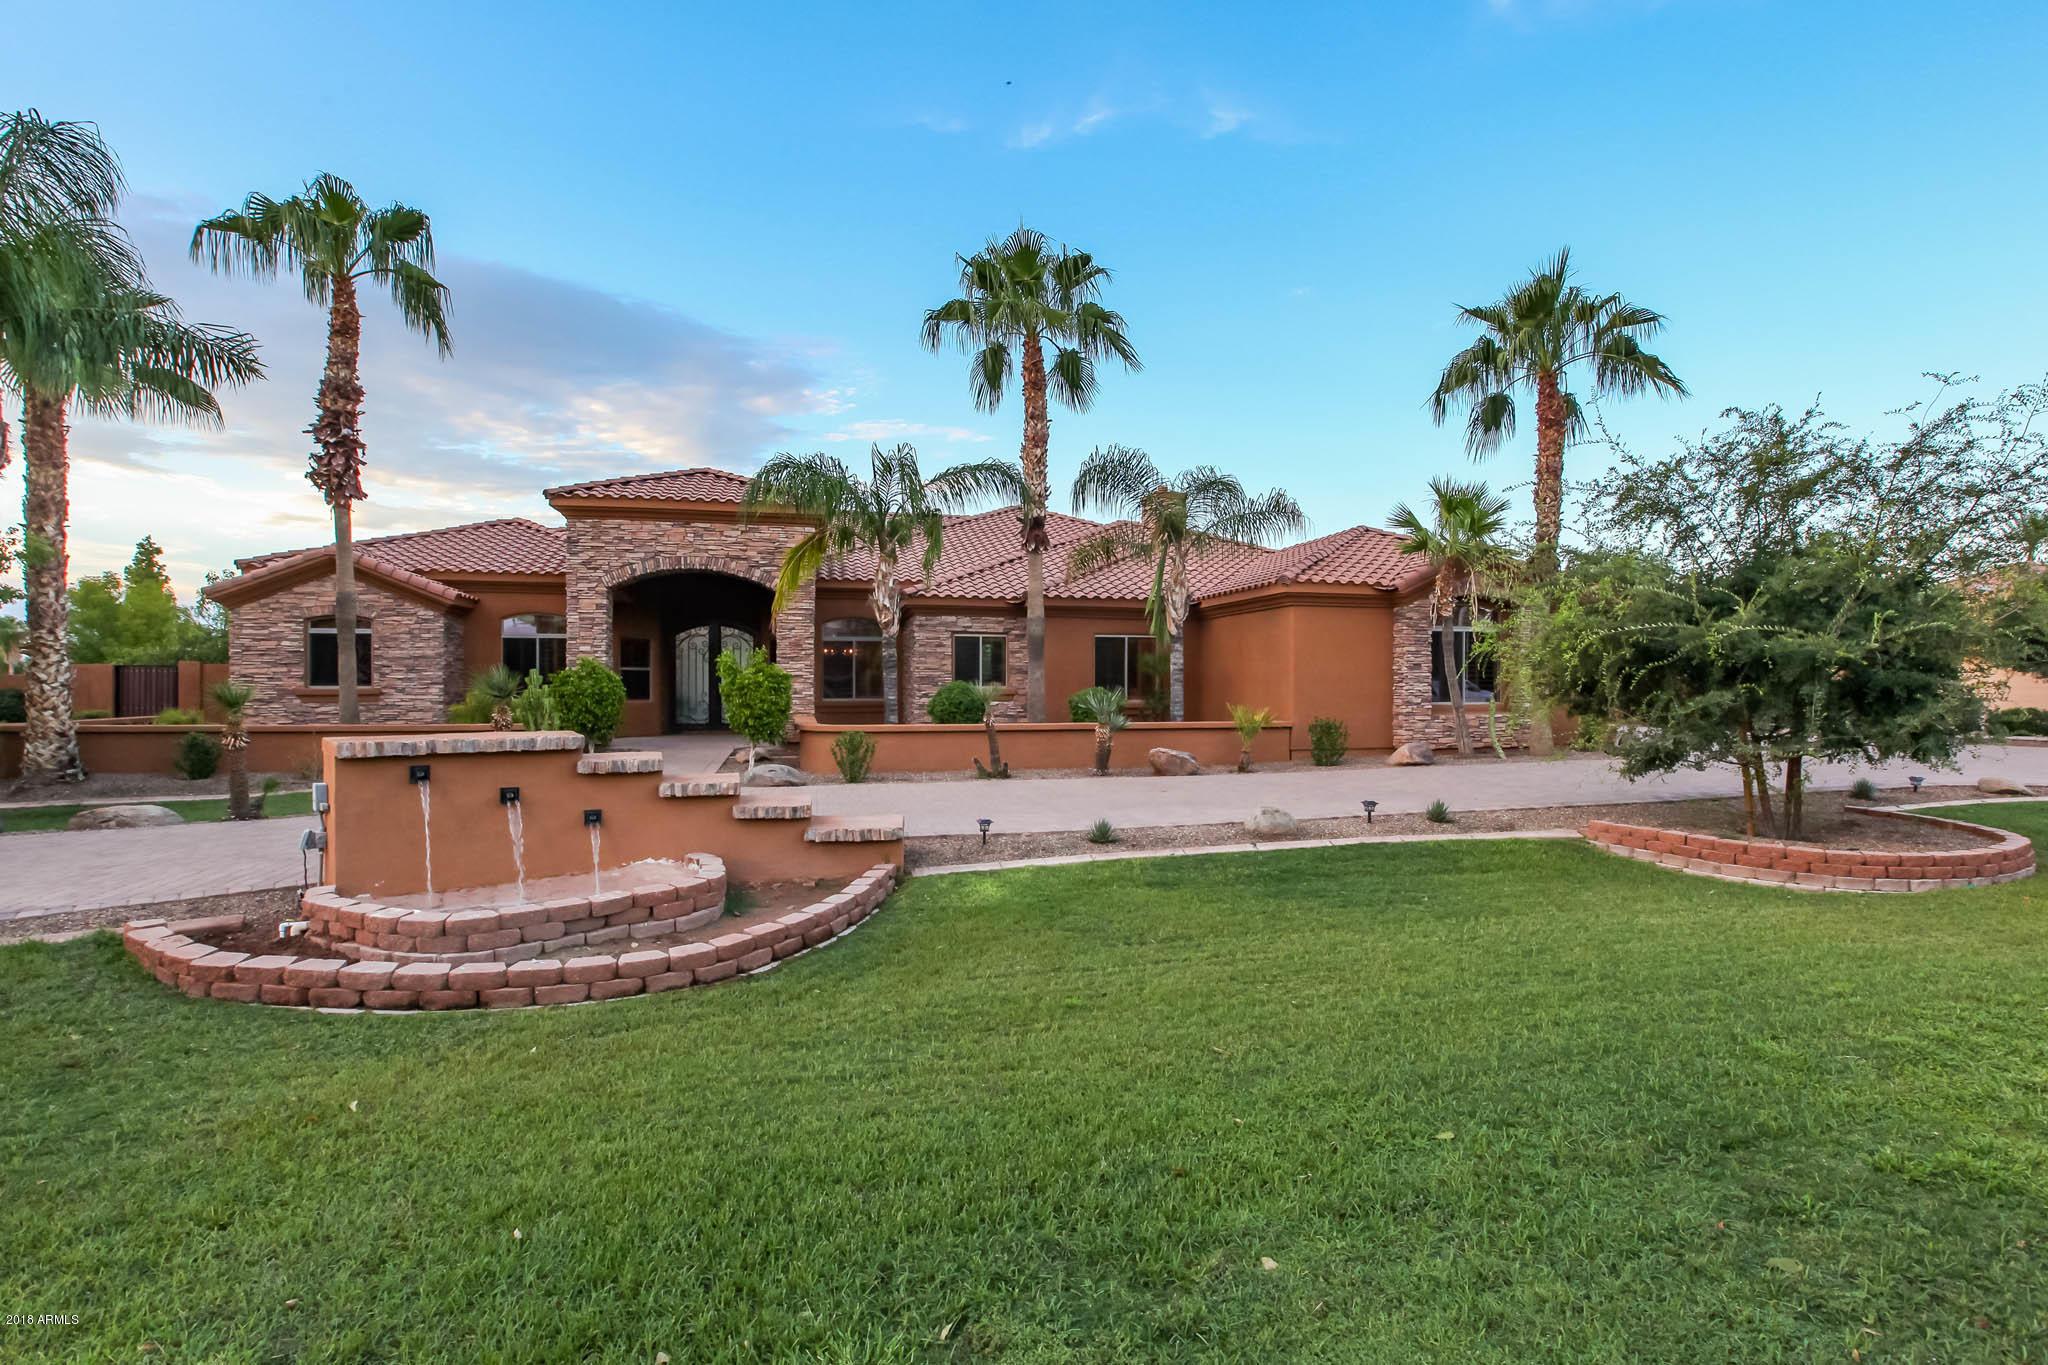 MLS 5819974 2550 E CHERRYWOOD Place, Chandler, AZ Chandler AZ Luxury Guest House